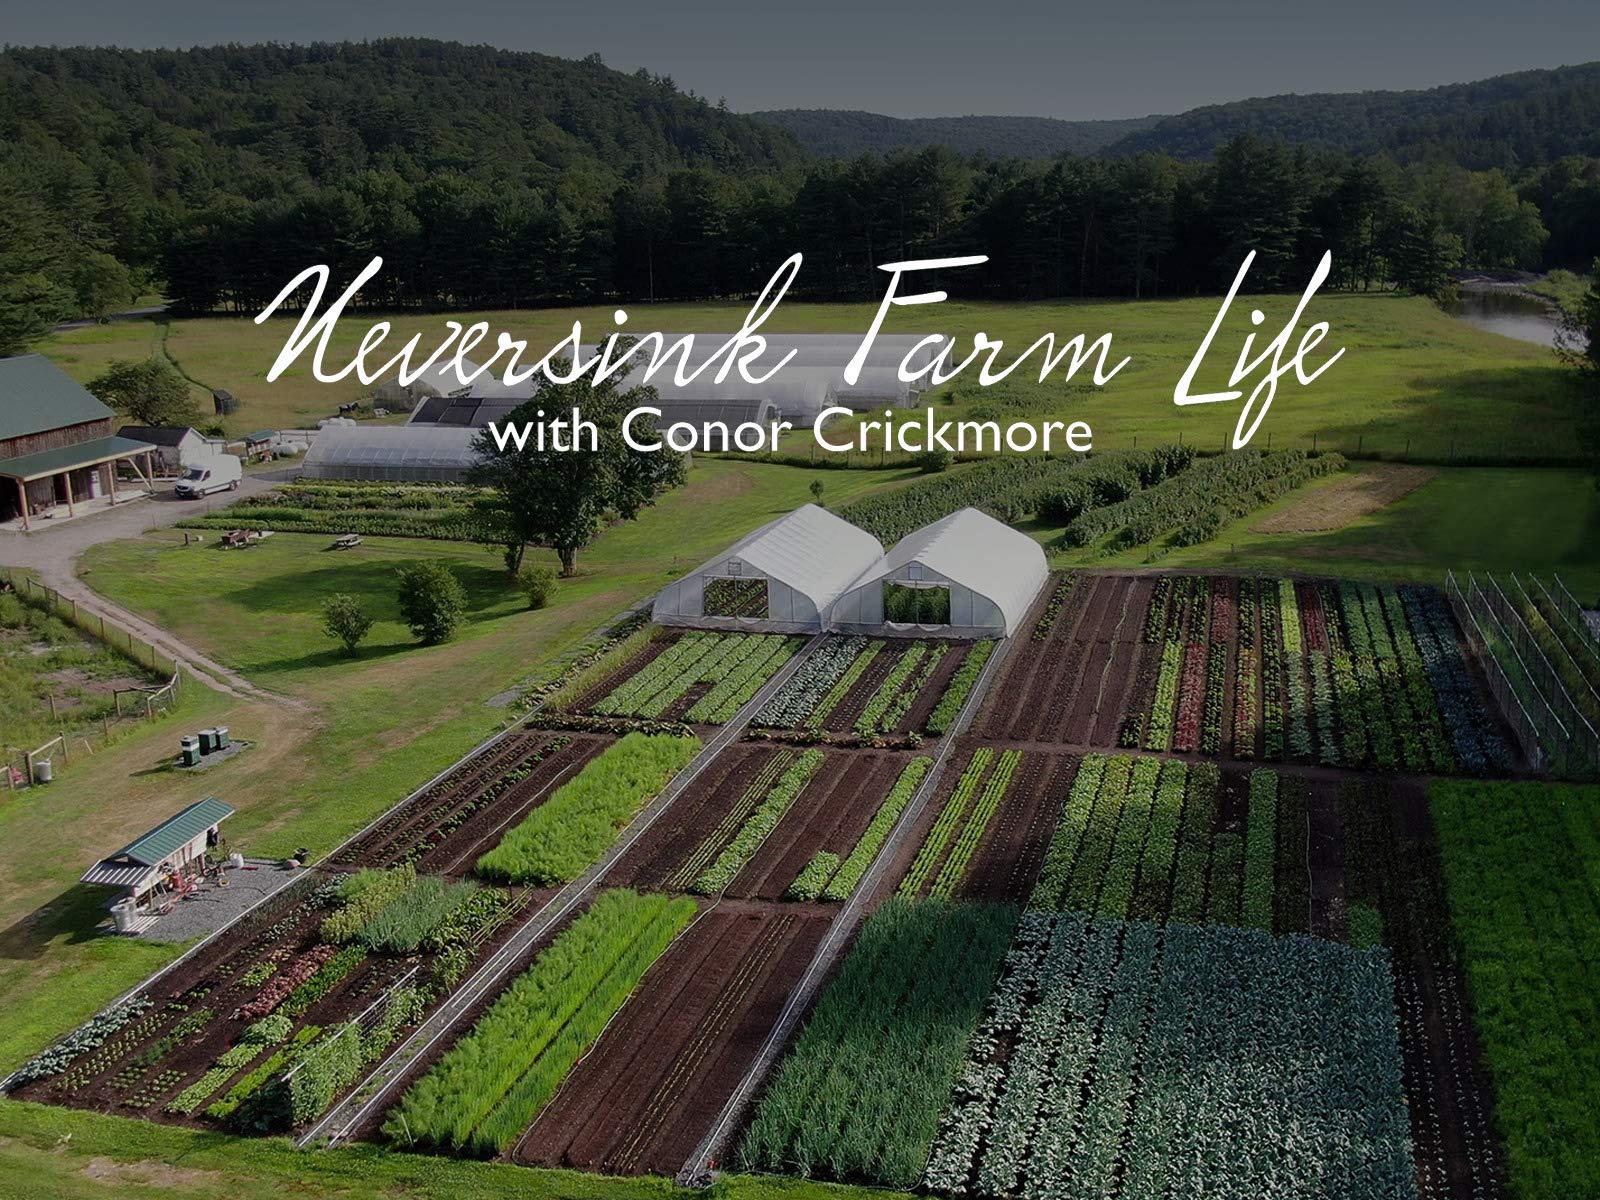 Neversink Farm LIfe